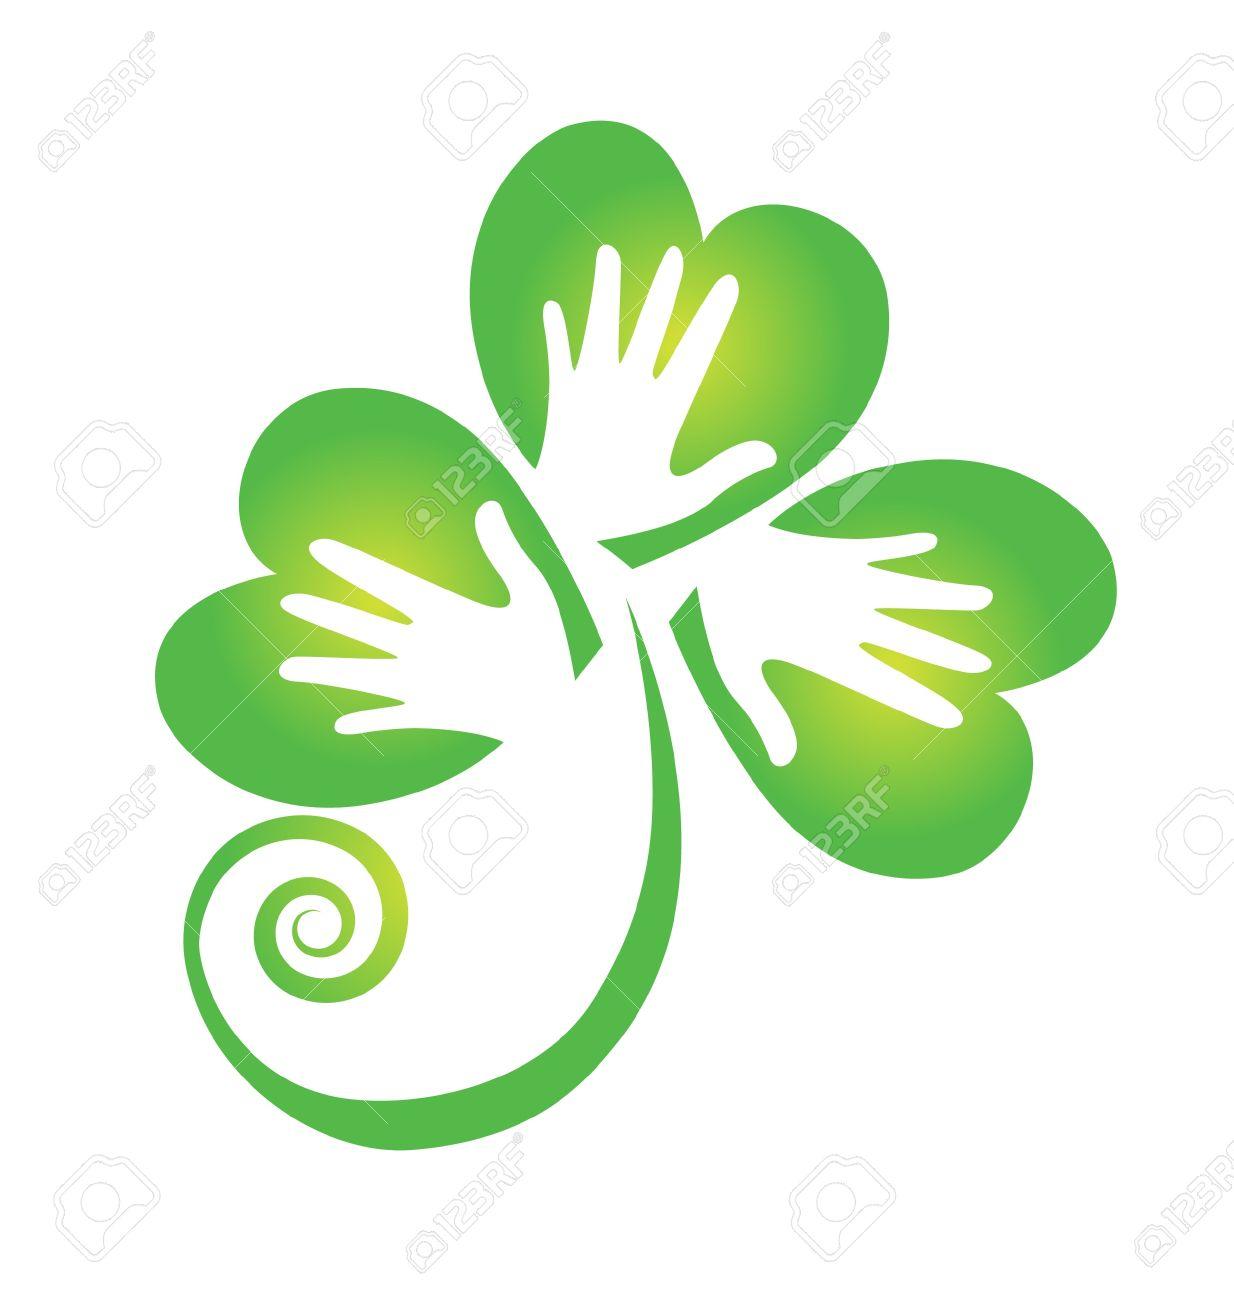 Clover hands logo Stock Vector - 18034951